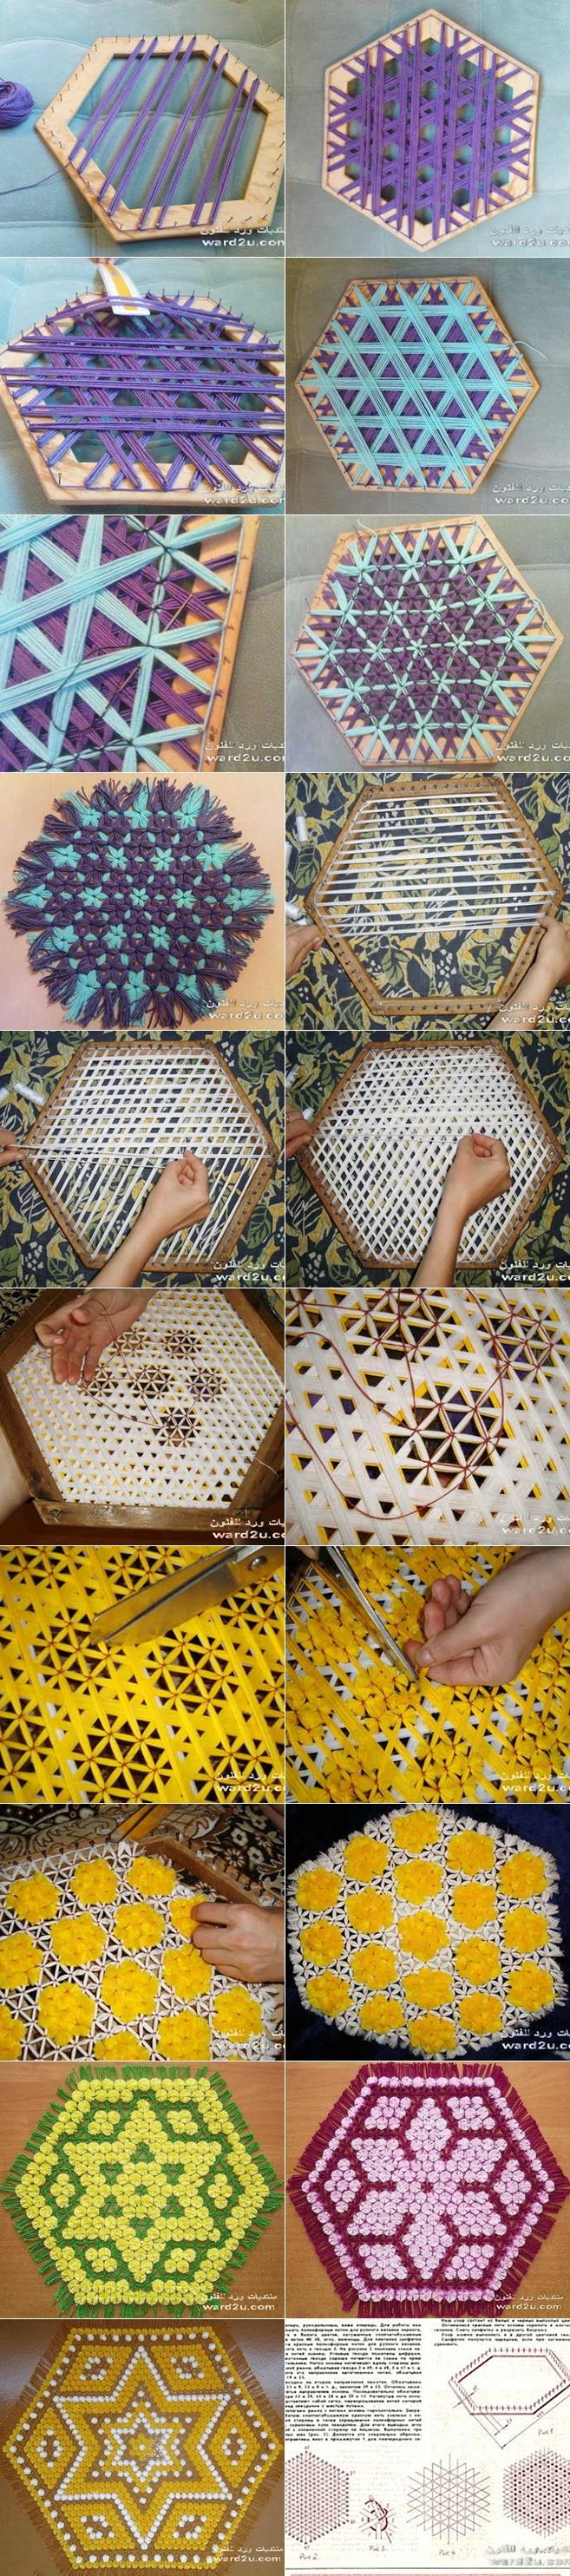 Hexagonal-coaster-tutorial